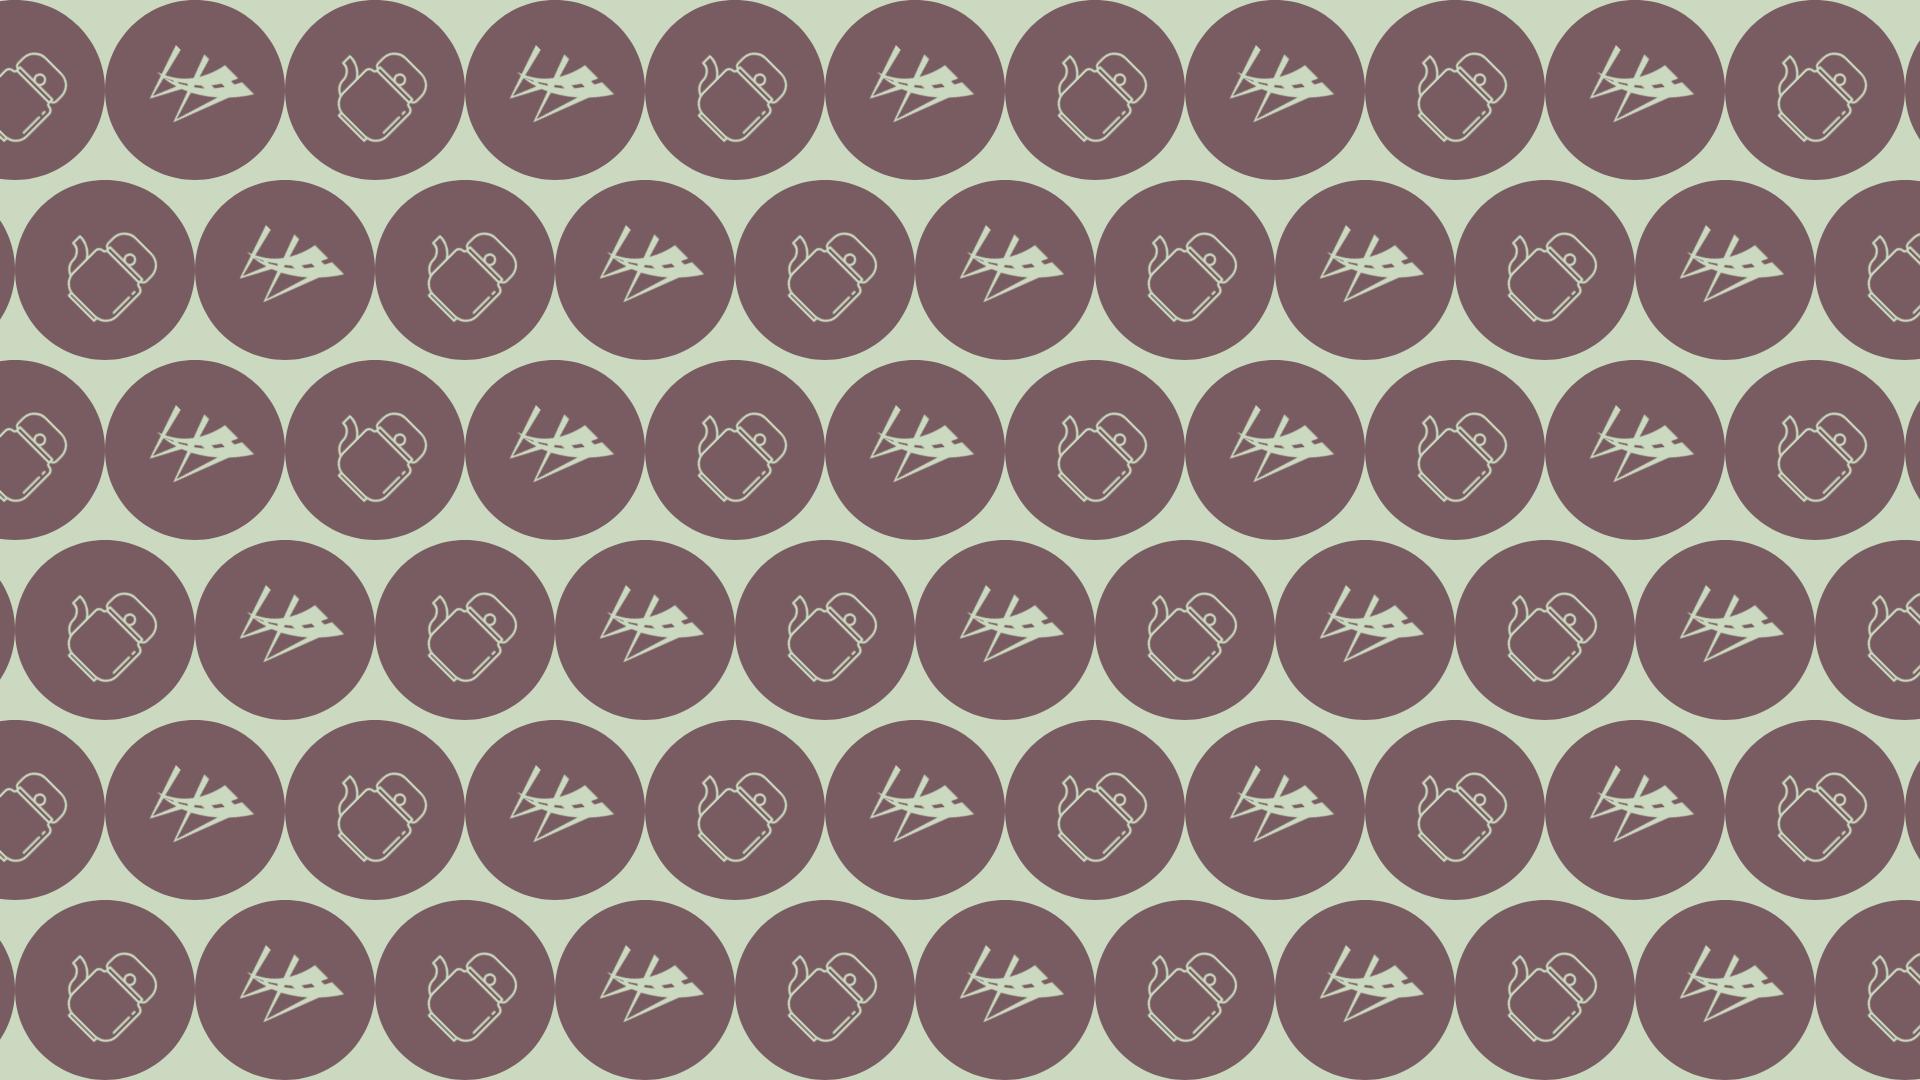 Pink, Pattern, Text, Purple, Design, Font, Magenta, Circle, Cup, Bridge, Black, Teapot, Pot,  Free Image